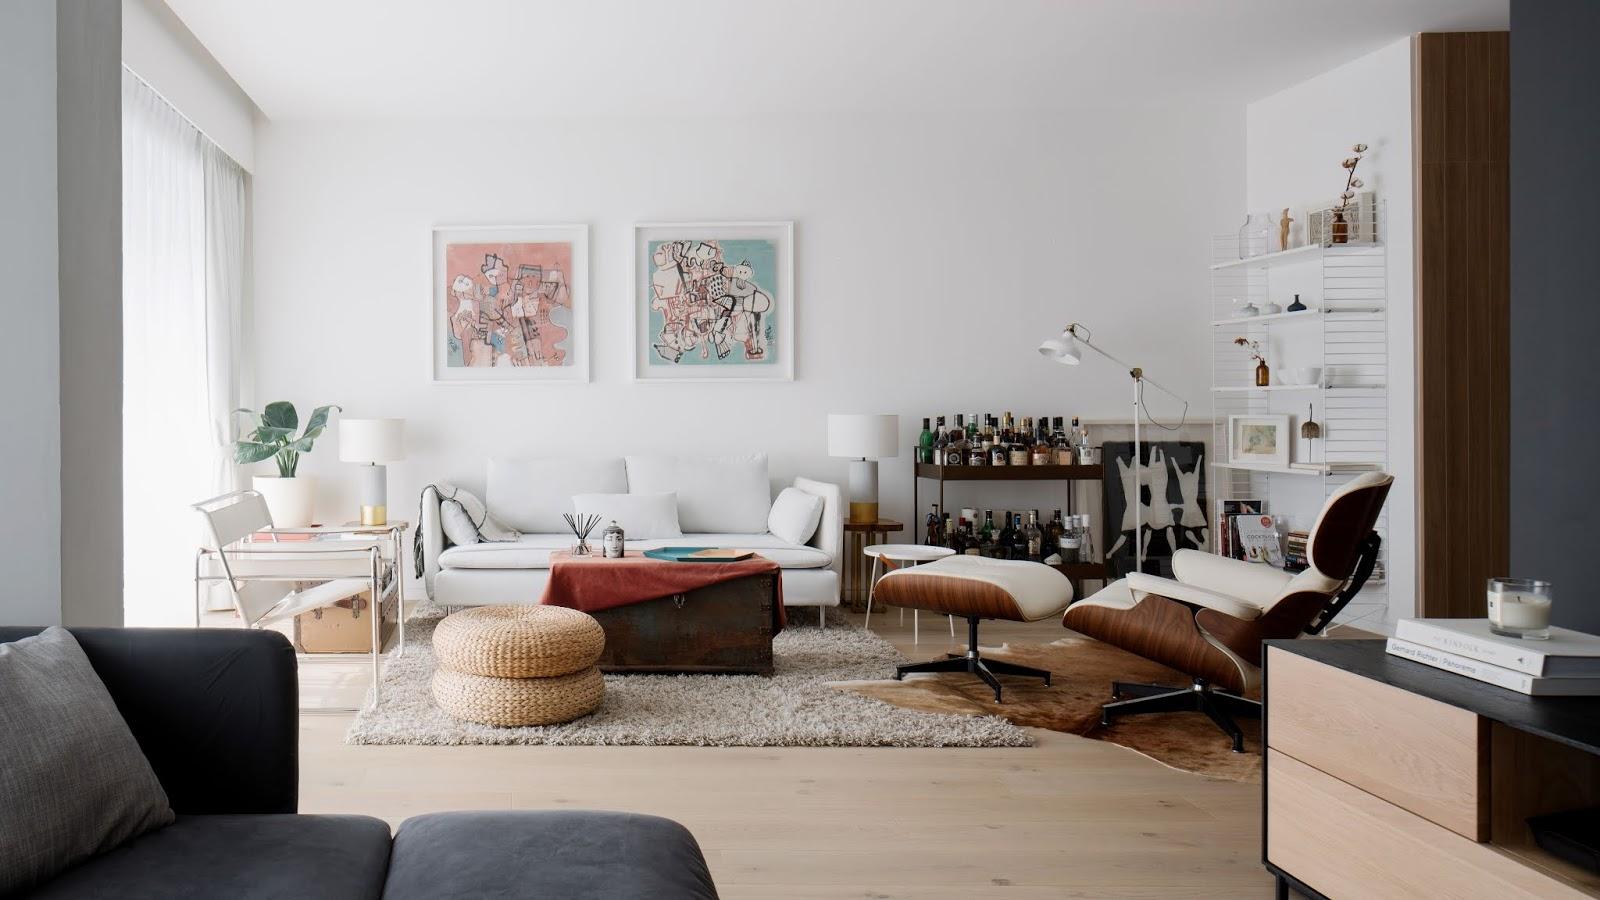 simplicity love: Project #11, Singapore | Studio Wills + Architects